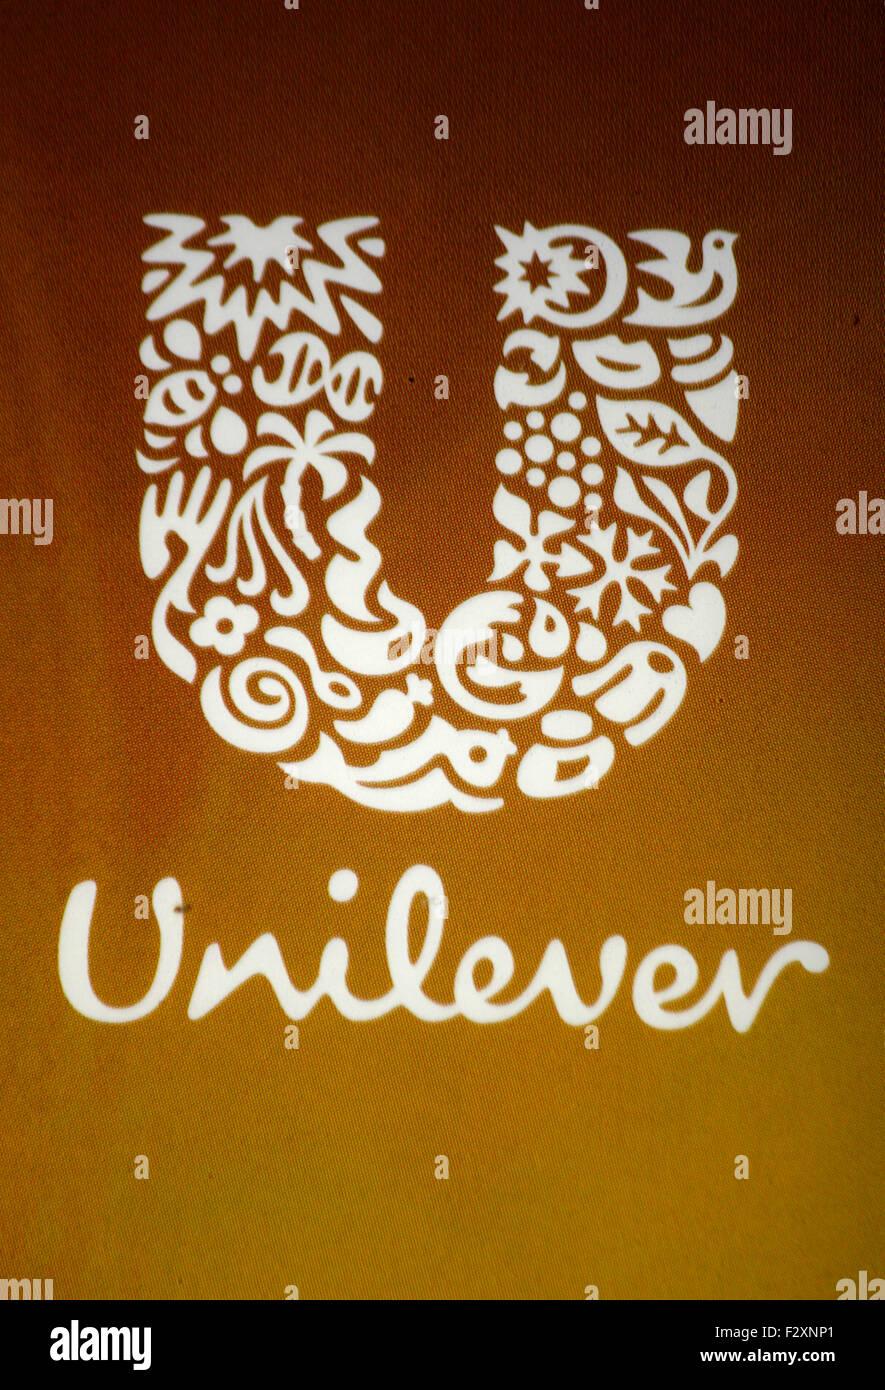 Markenname: 'Unilever', Berlin. - Stock Image